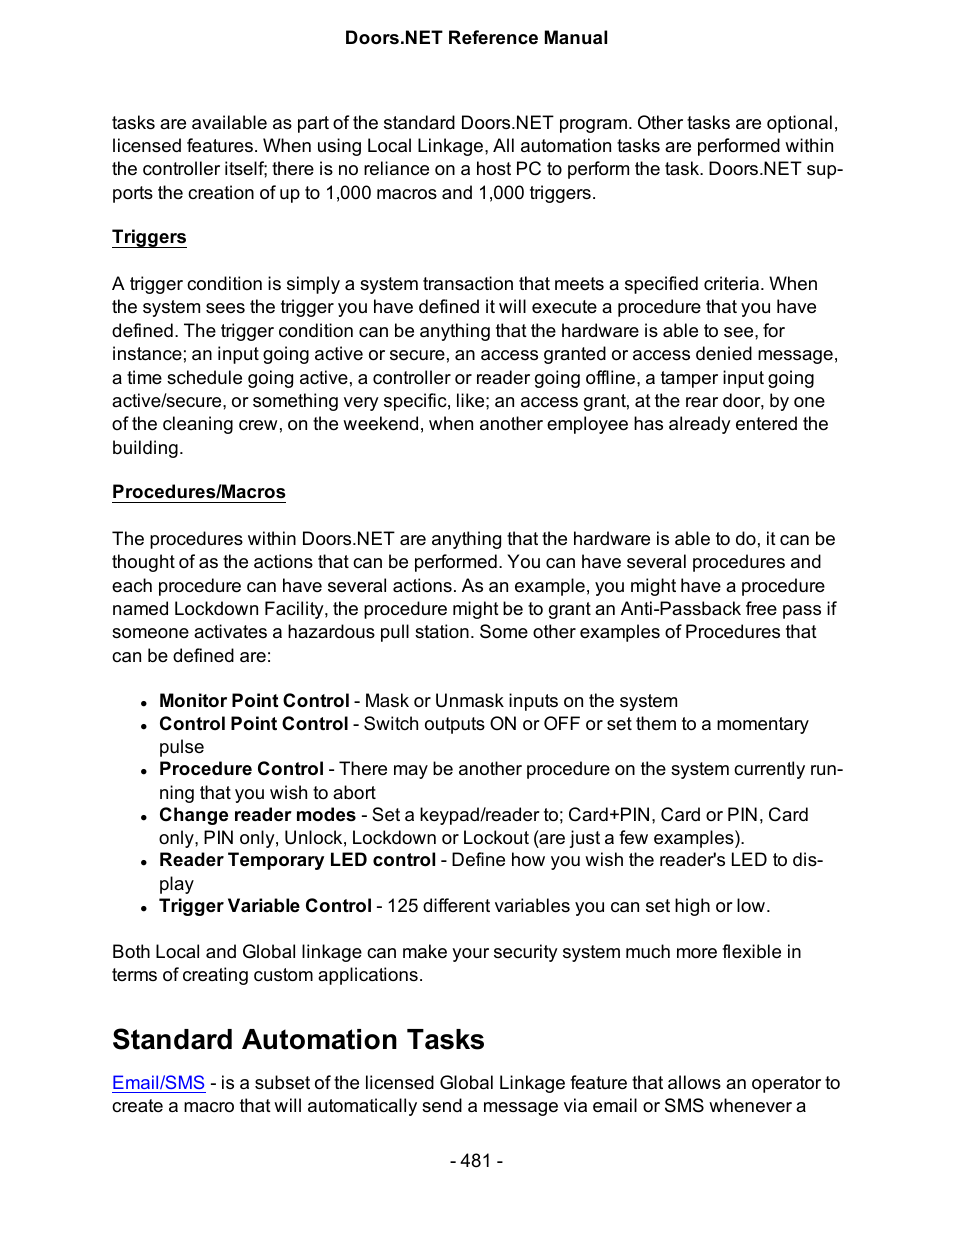 Standard automation tasks | Keri Systems Doors.NET Manual User Manual | Page 481 / 602